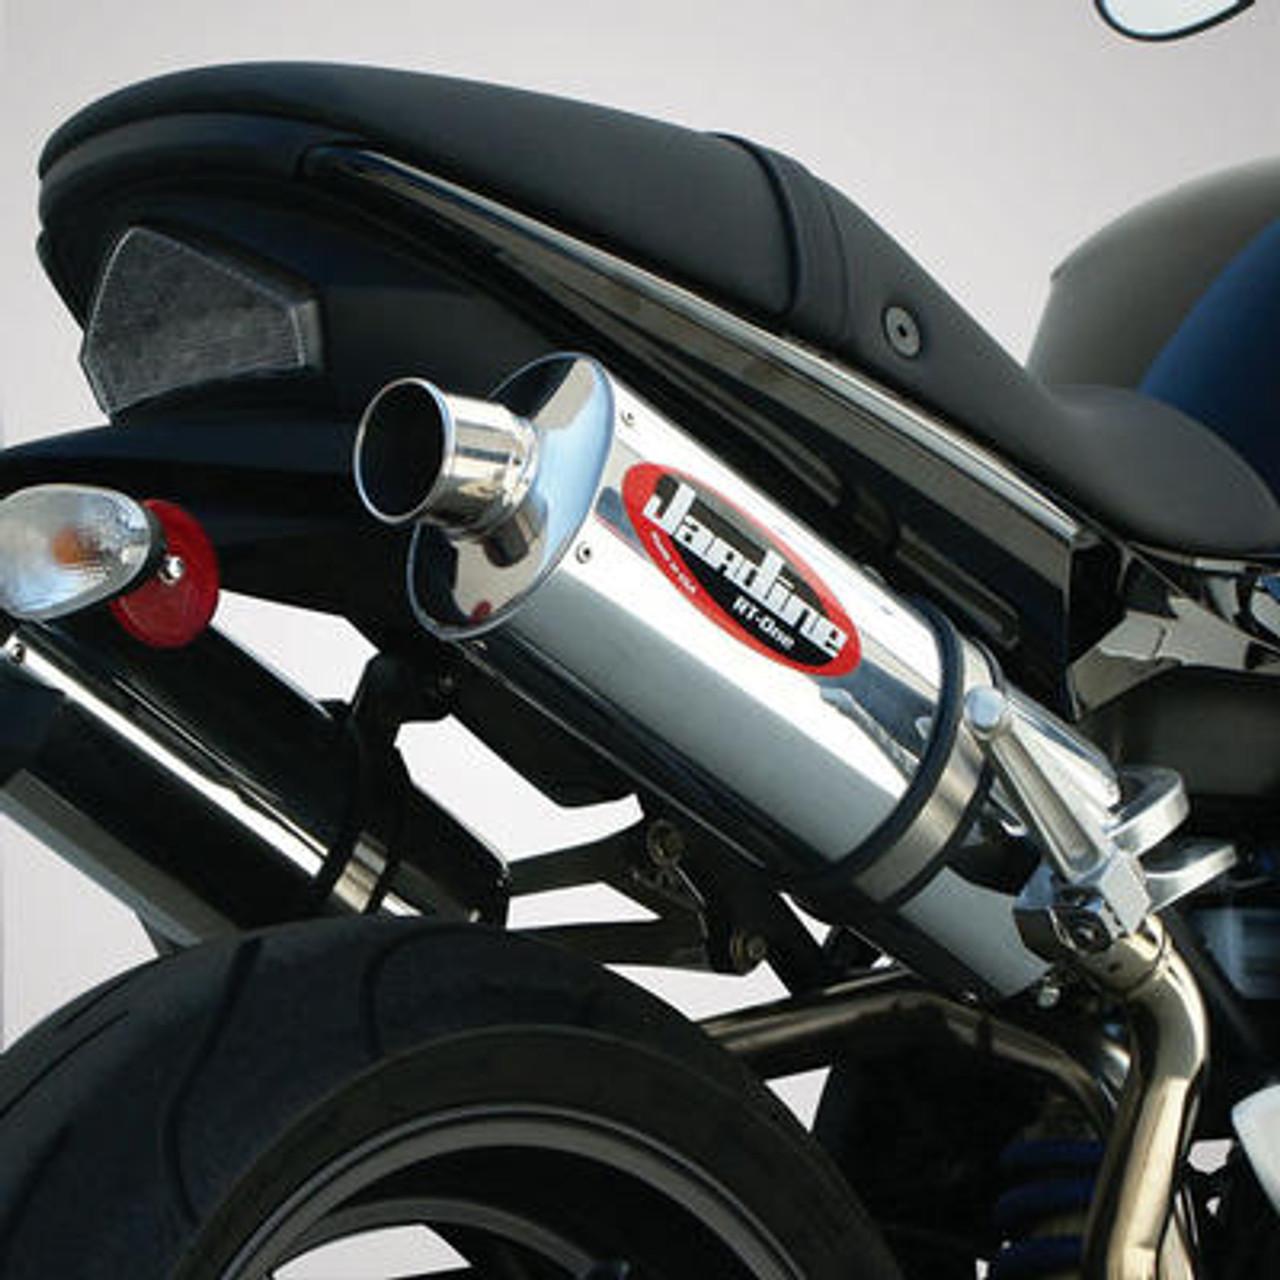 Jardine Rt1 Carbon Fiber Slip On Exhaust Pipe Muffler Triumph Speed